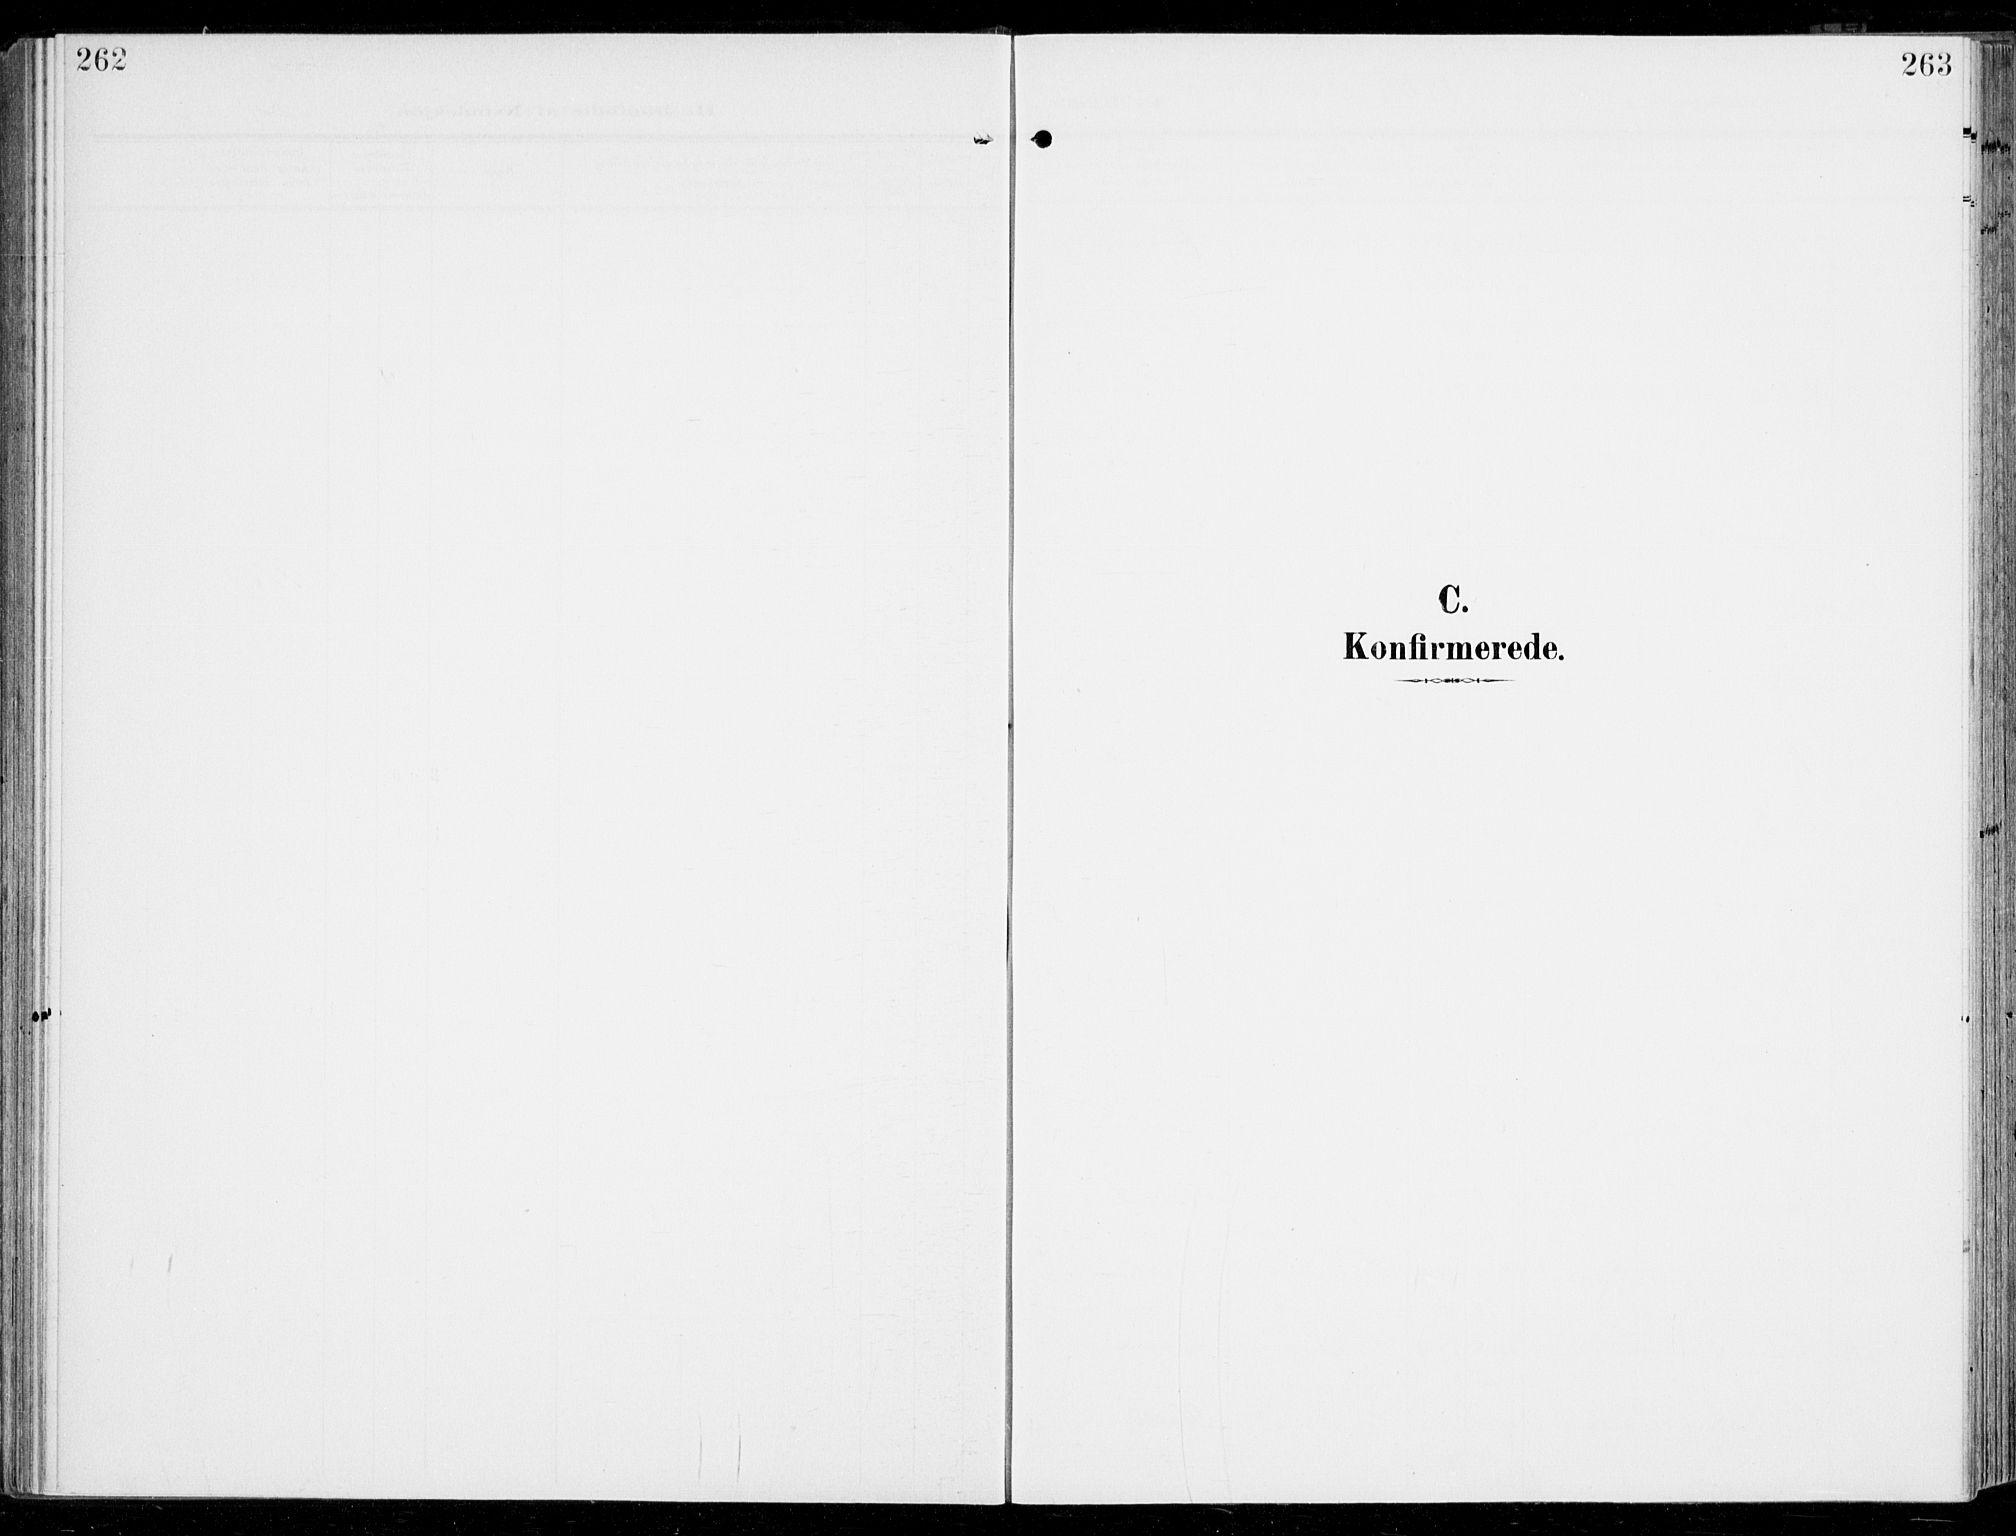 SAKO, Sem kirkebøker, F/Fb/L0006: Ministerialbok nr. II 6, 1905-1918, s. 262-263